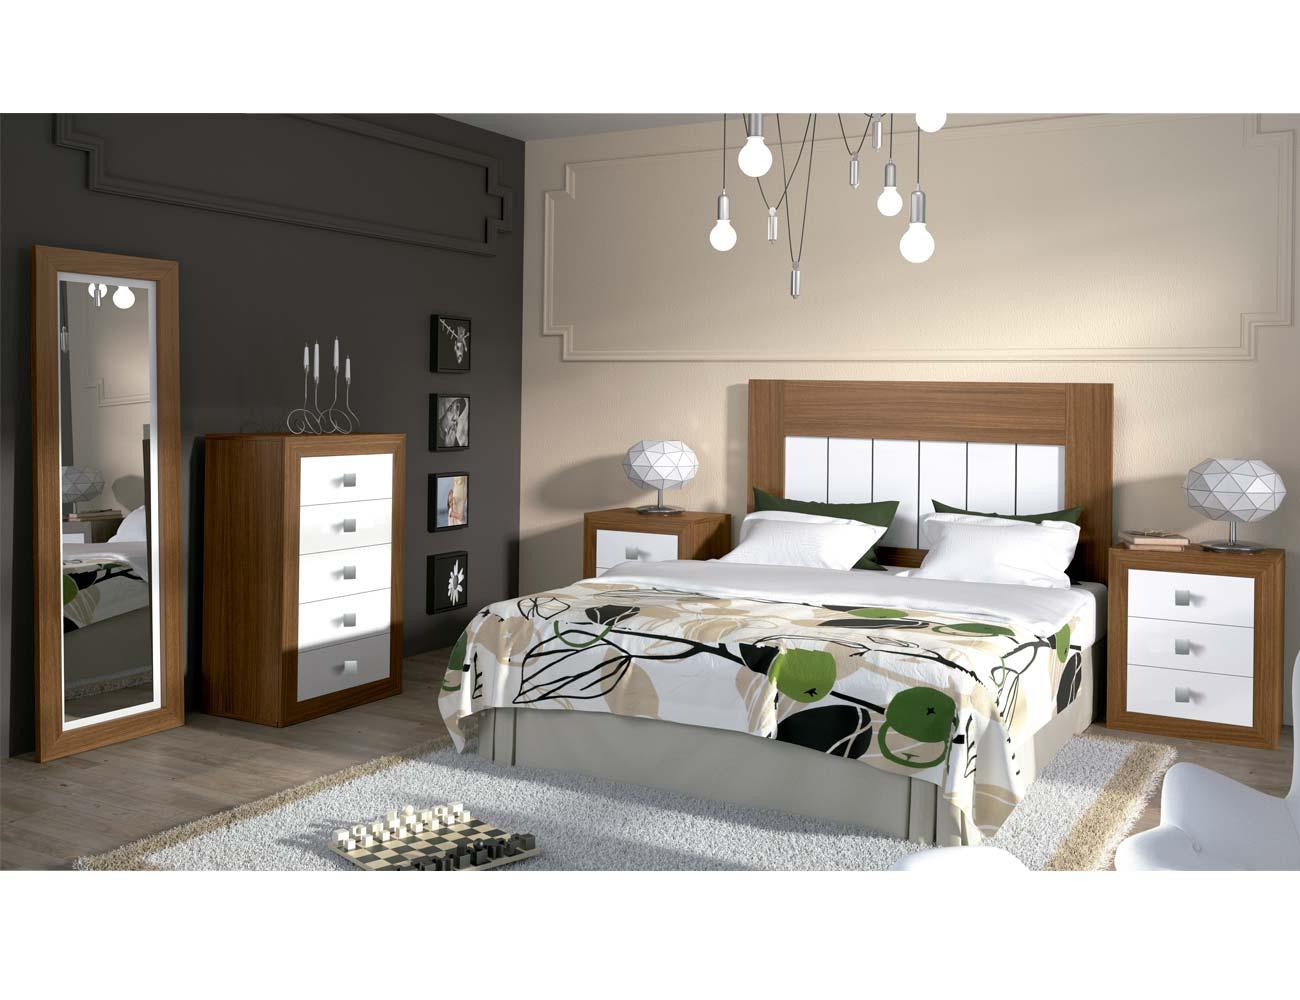 Dormitorio matrimonio moderno 08 nogal blanco